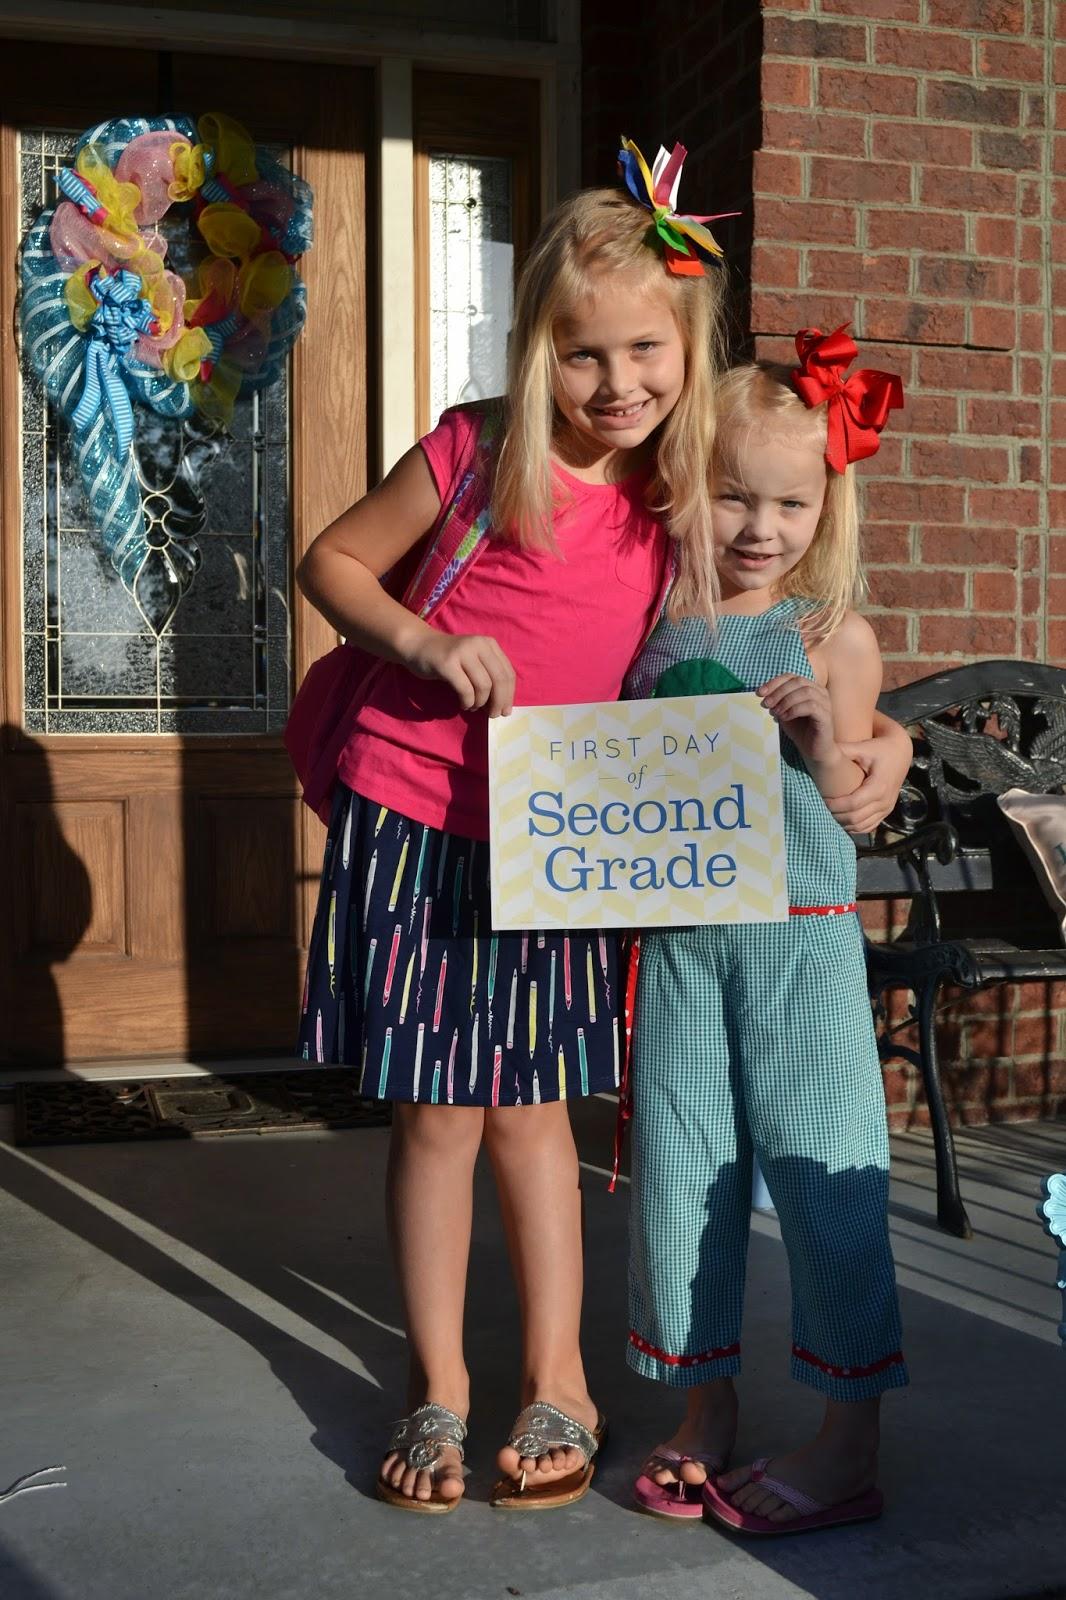 DSC 0441 001 - First Day Of School Outfit Kindergarten